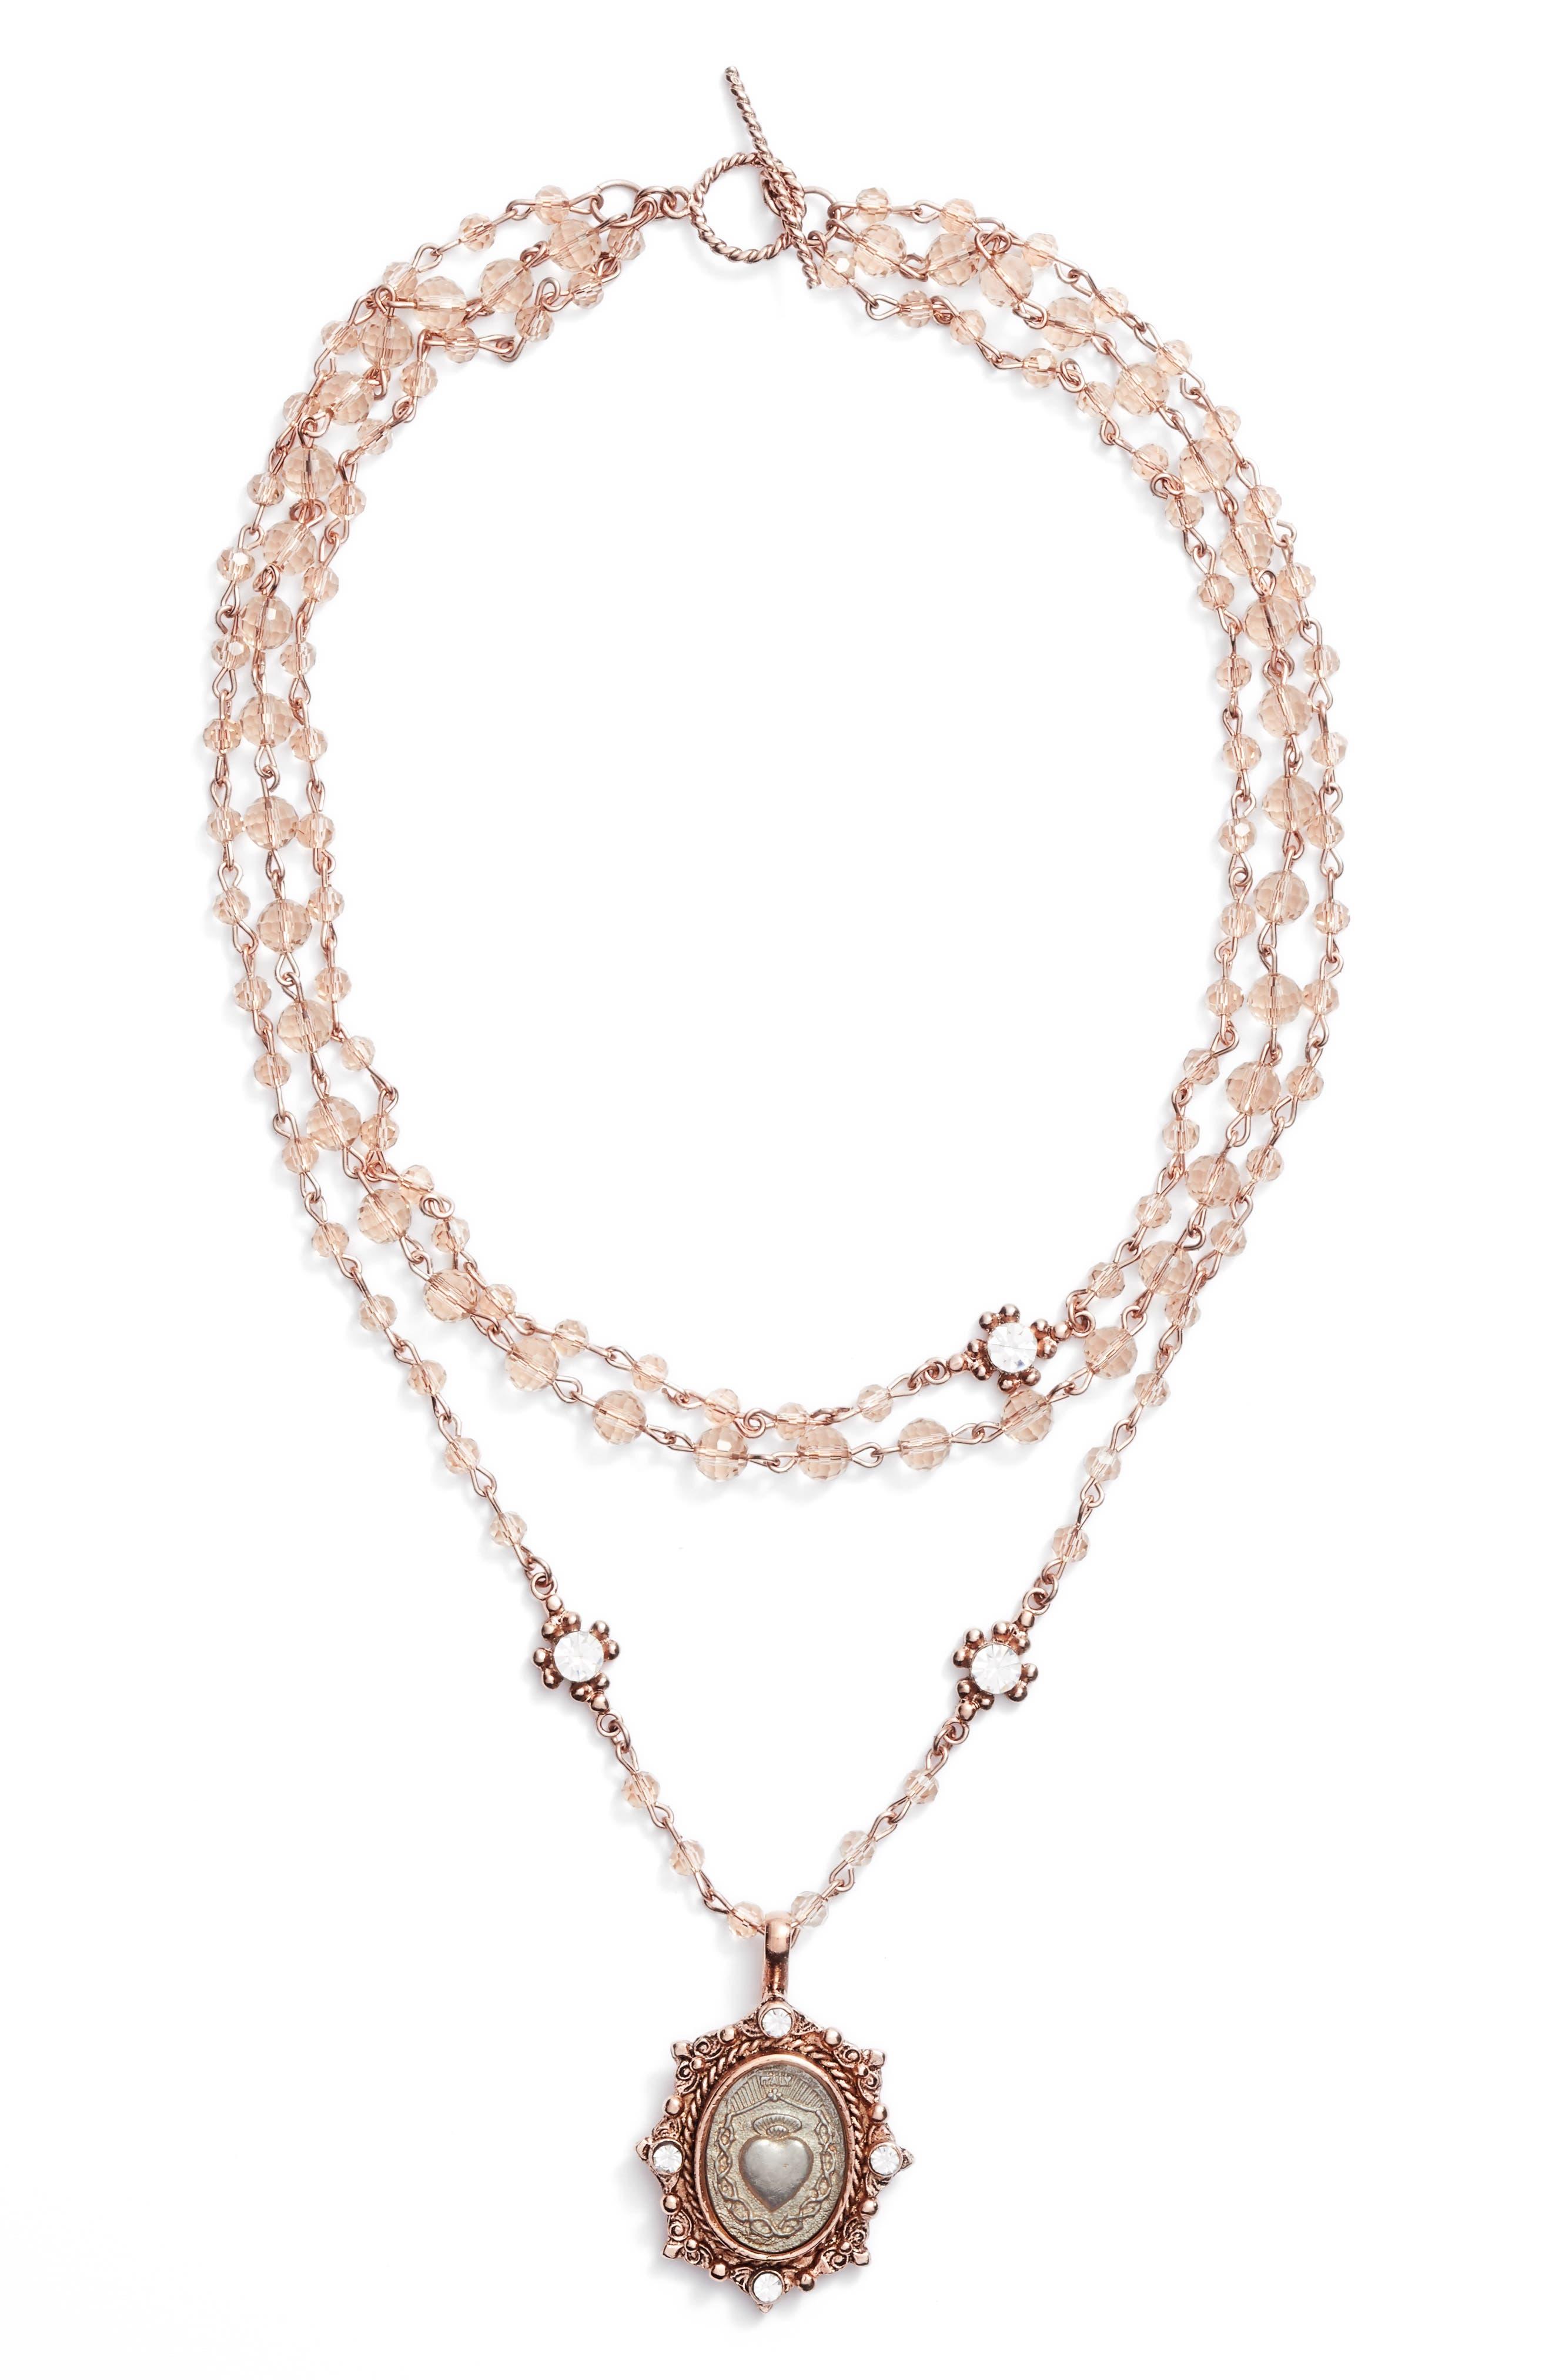 Sacred Heart Magdalena Multistrand Necklace,                         Main,                         color, Rose Gold/ Champagne